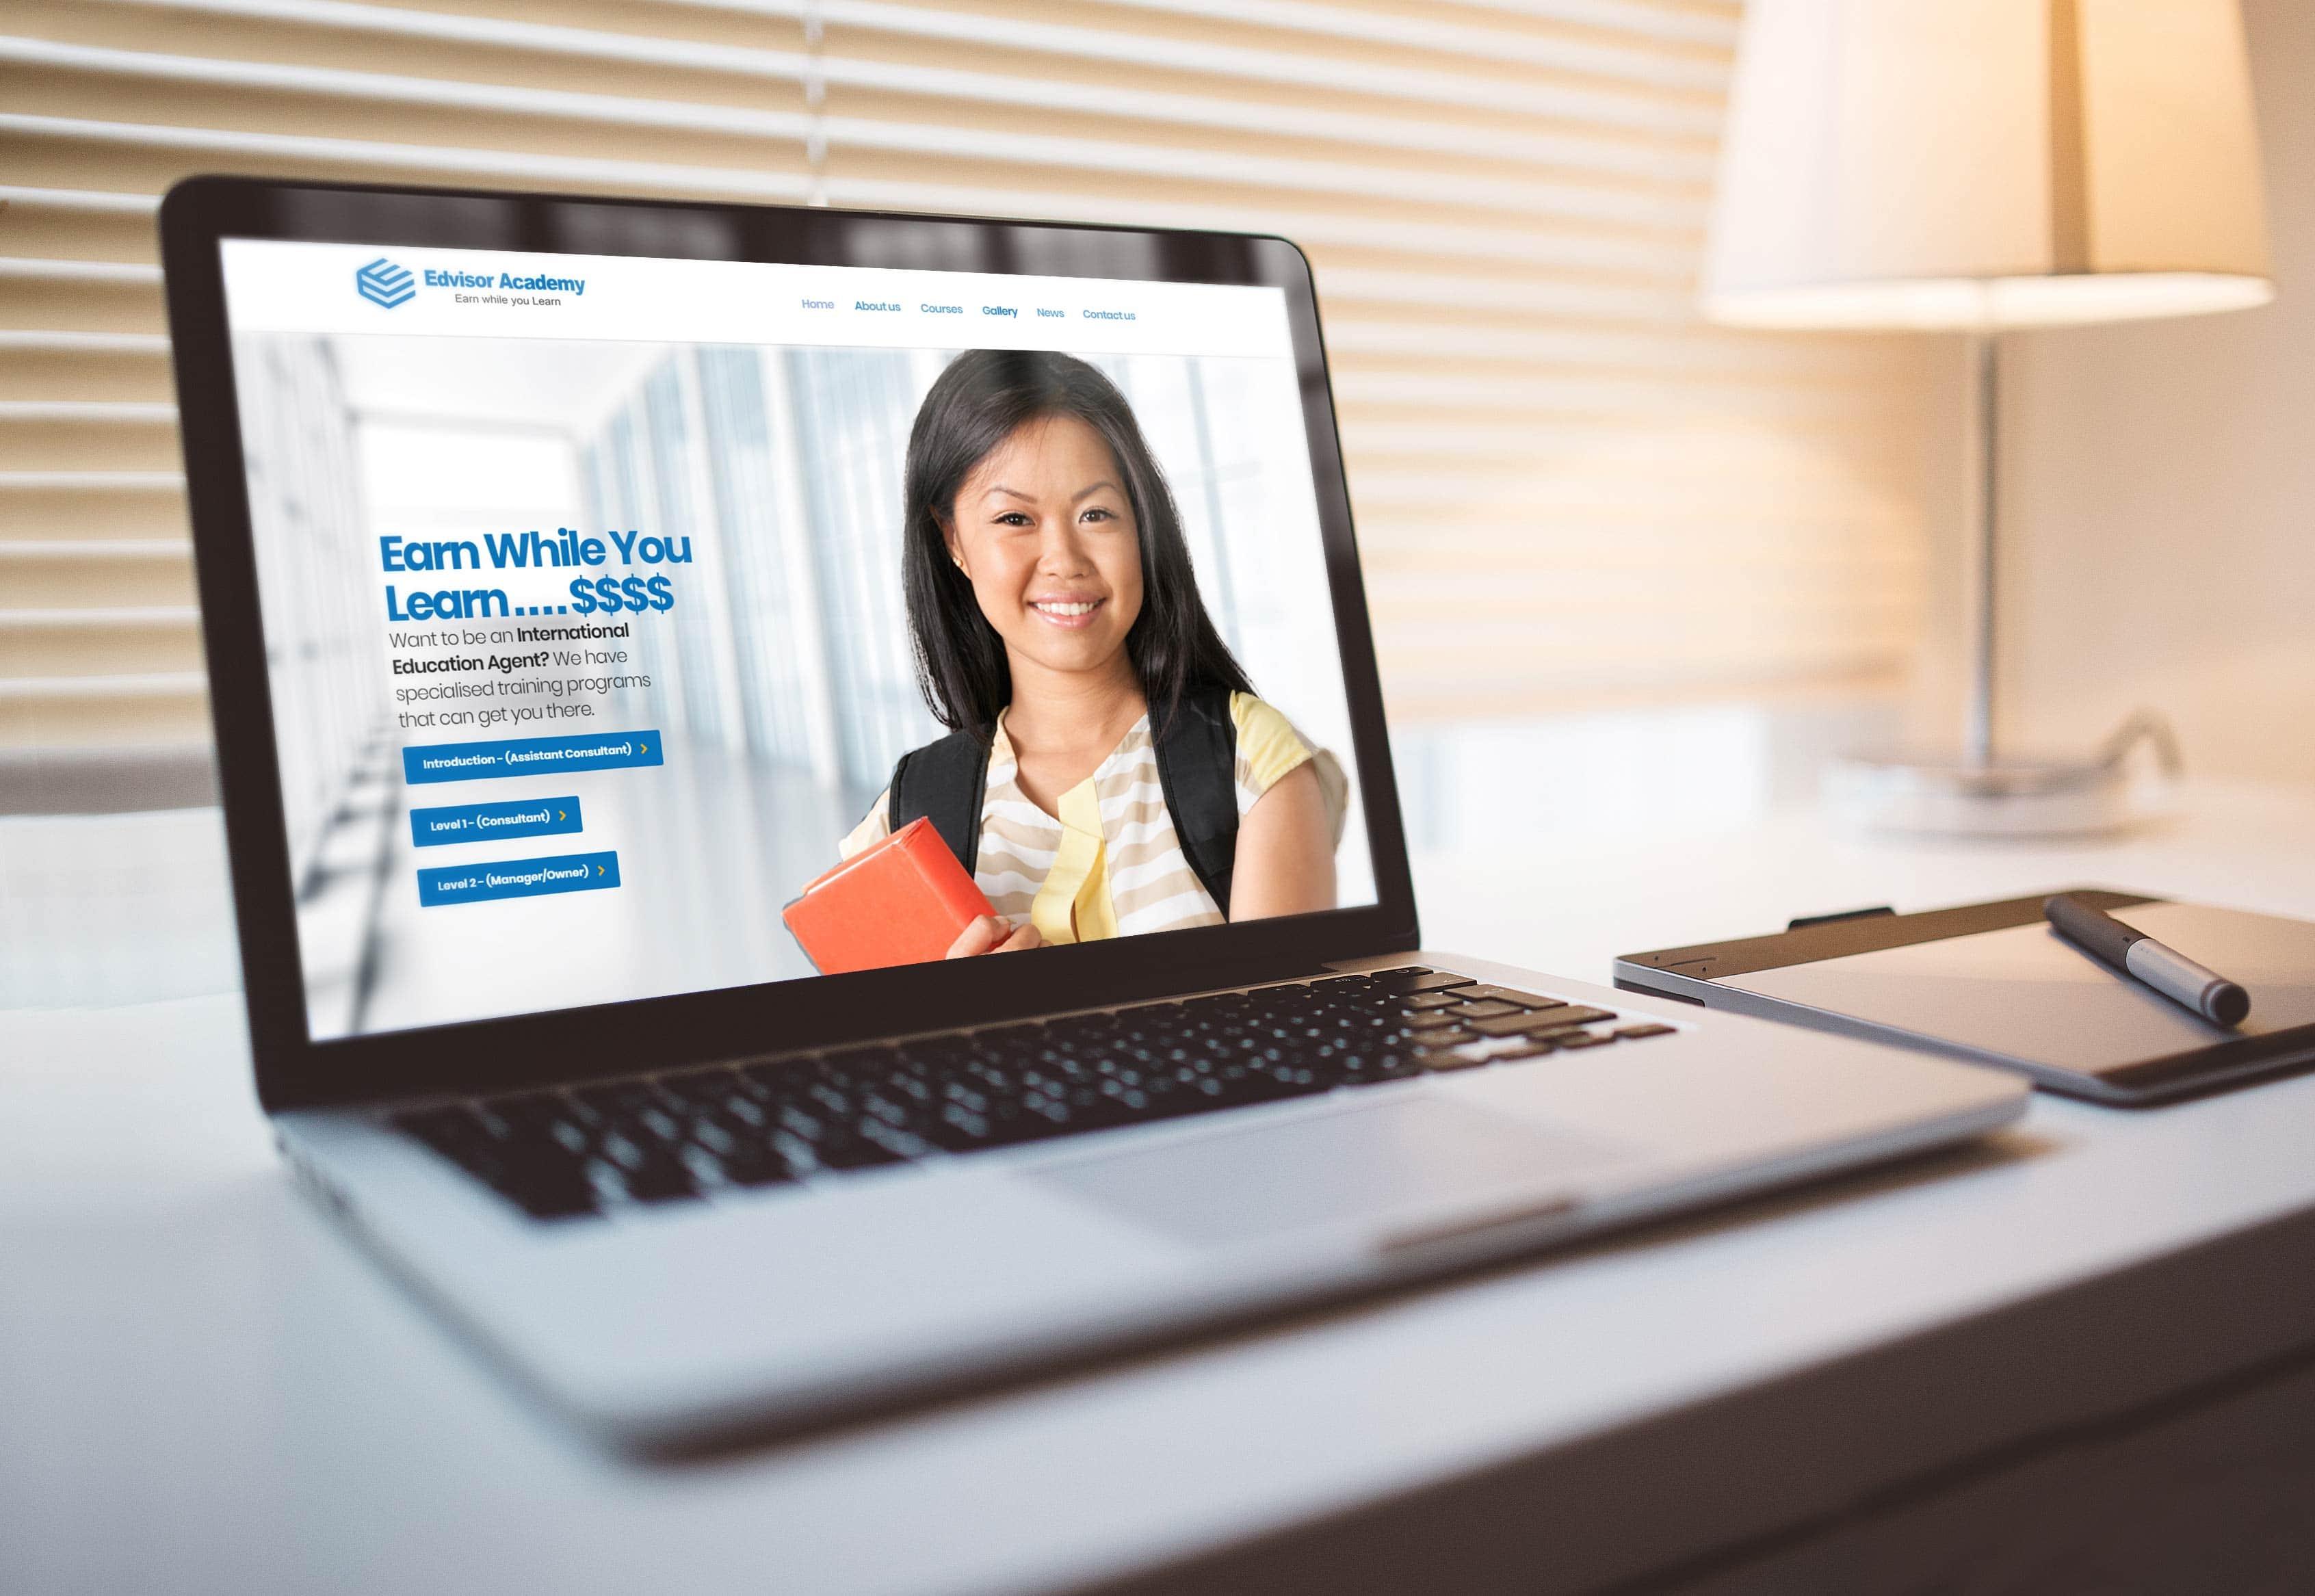 Edvisor Academy website by TA Digital